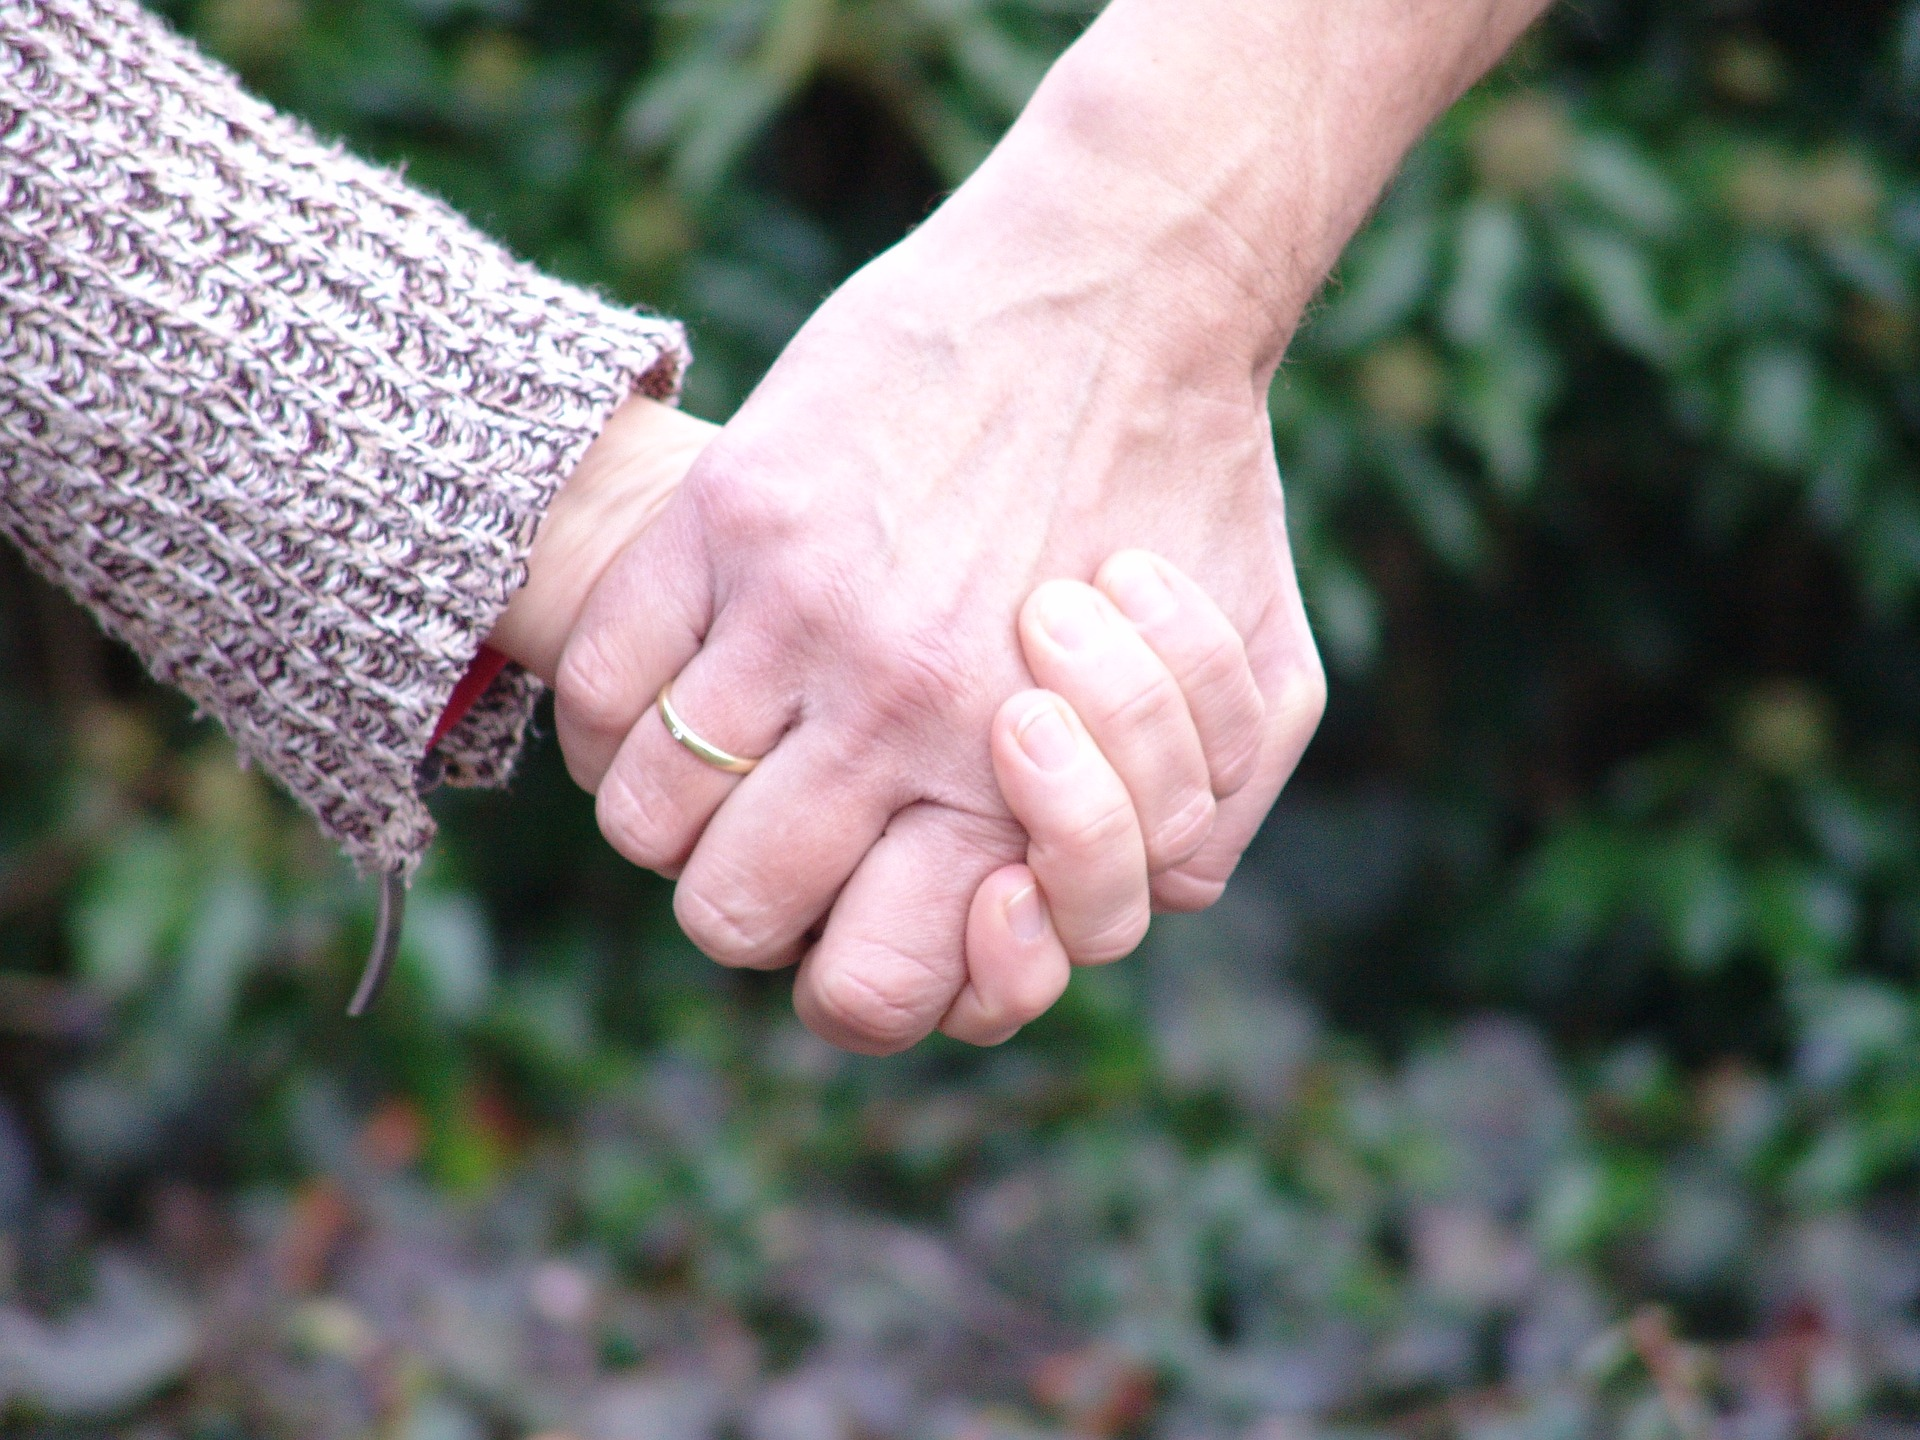 Podaj rękę